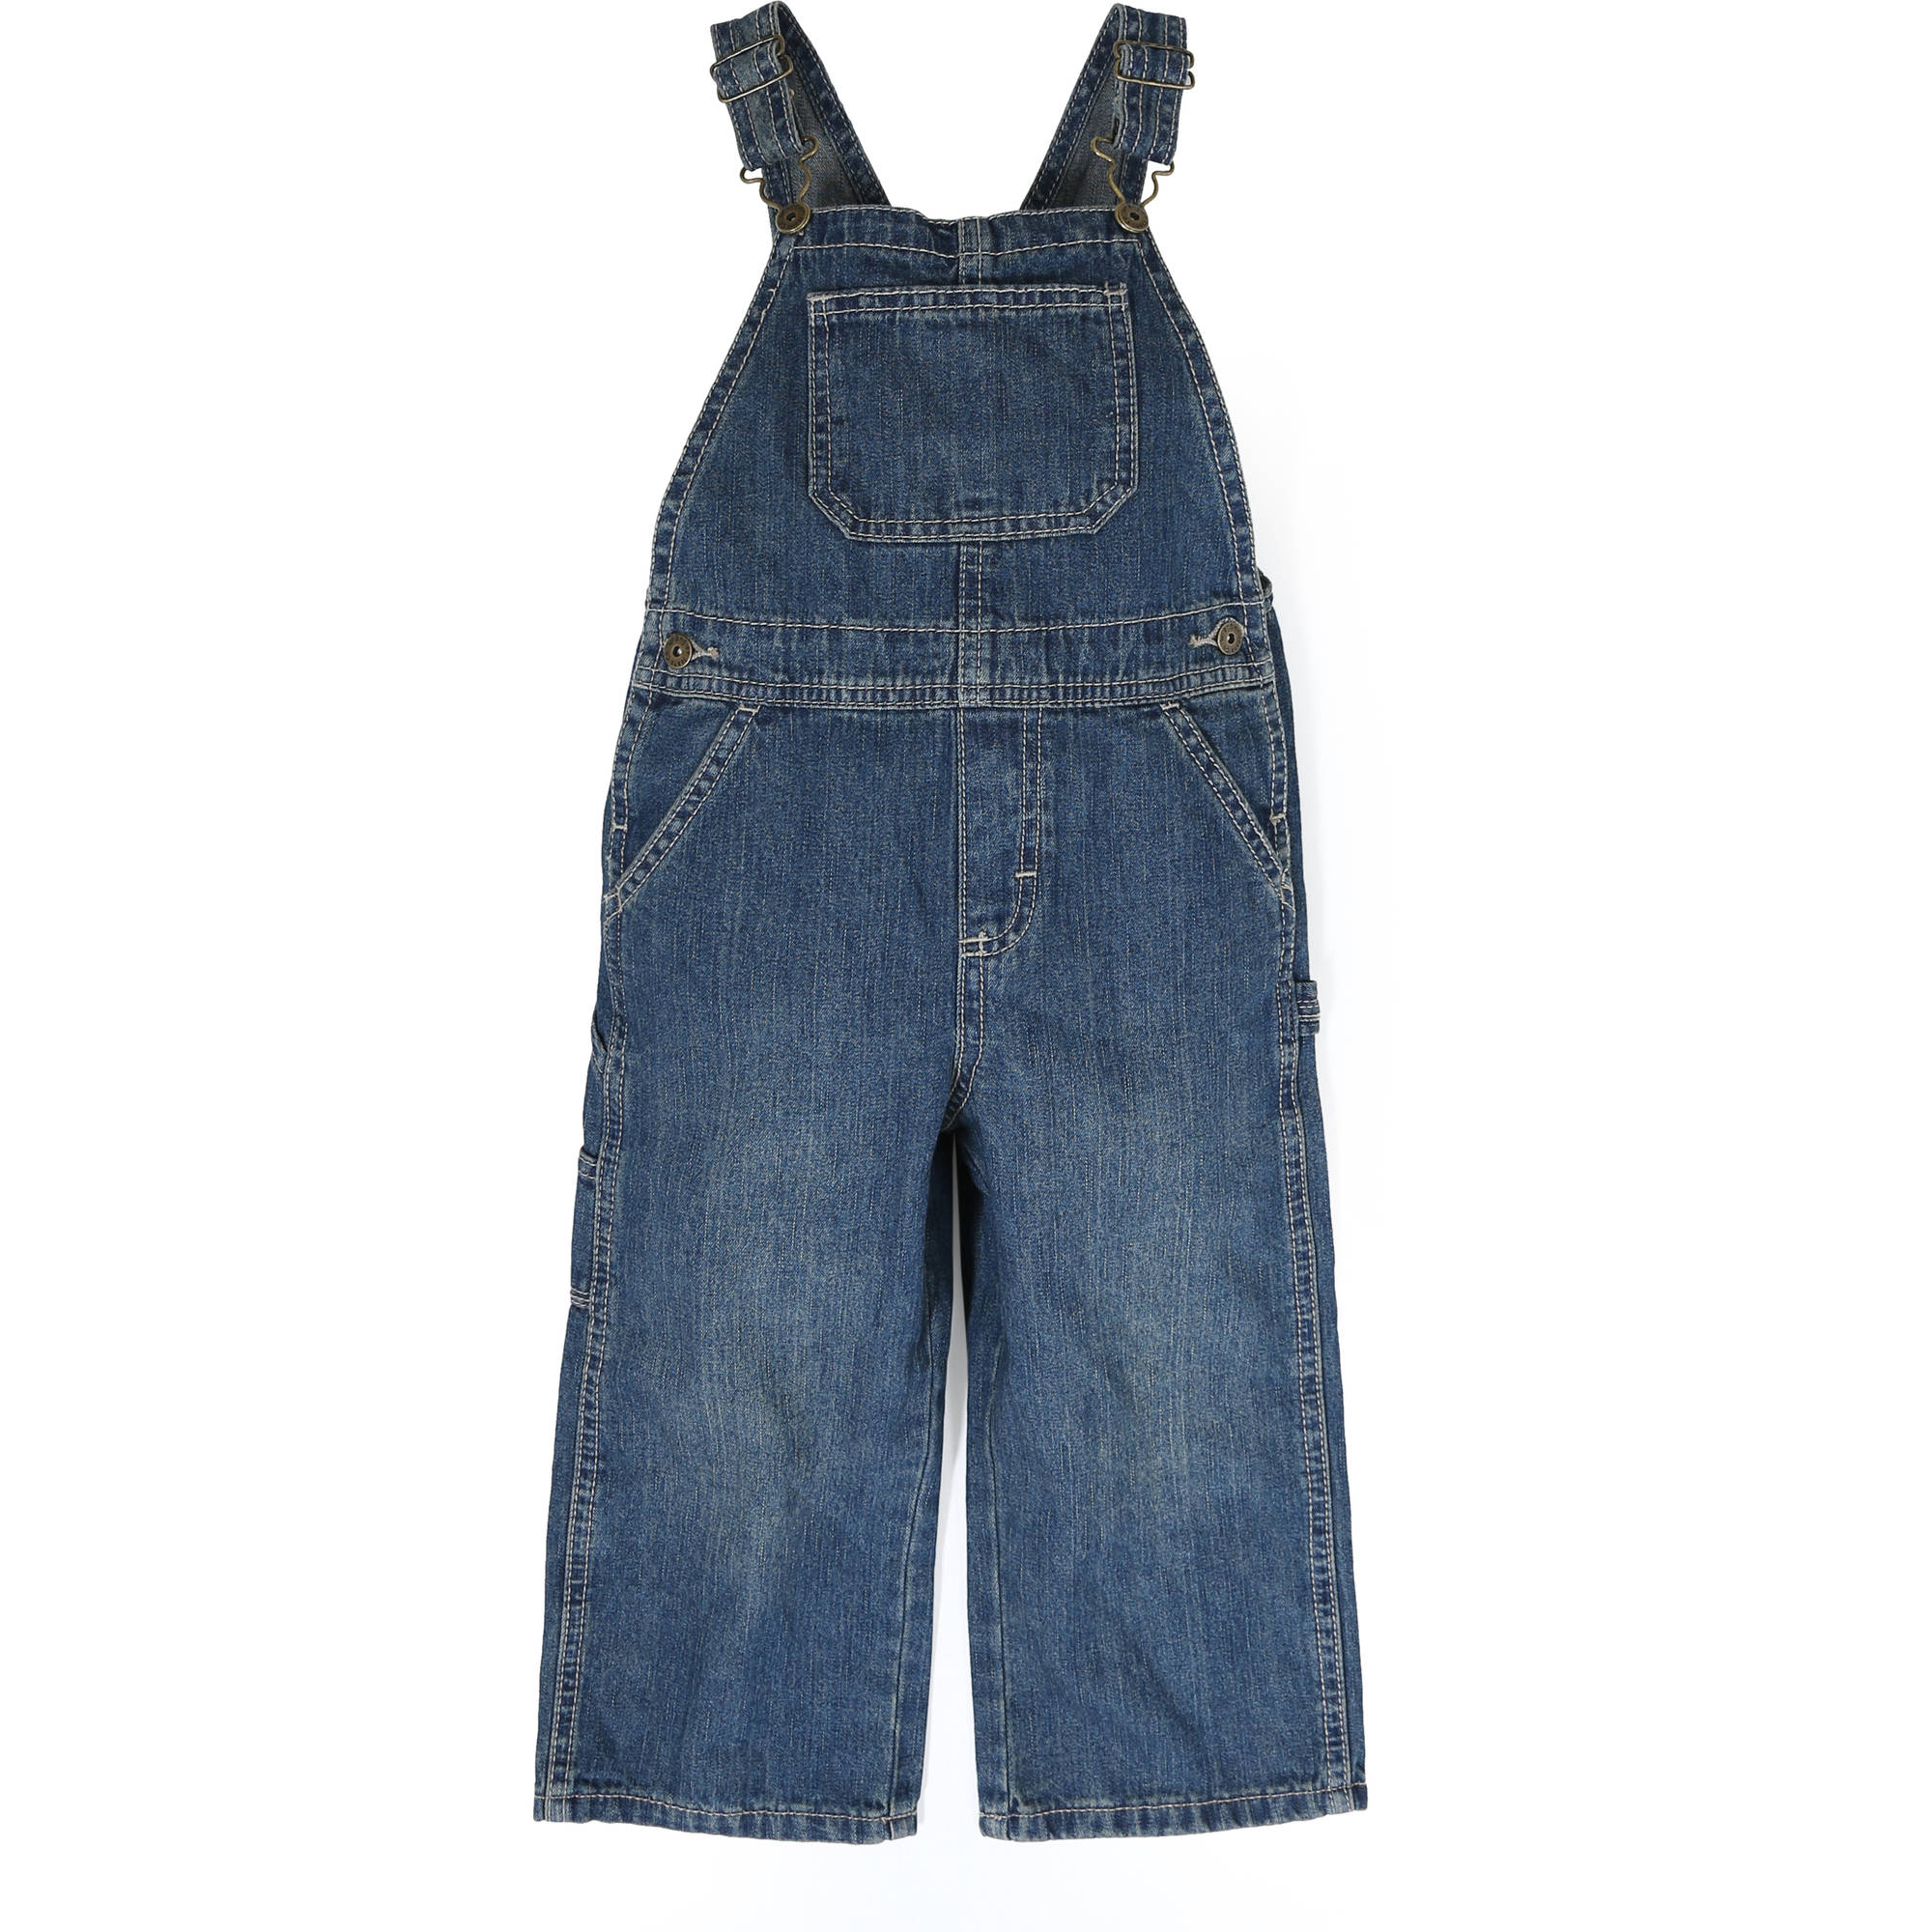 Wrangler Baby Toddler Boy Premium Overalls